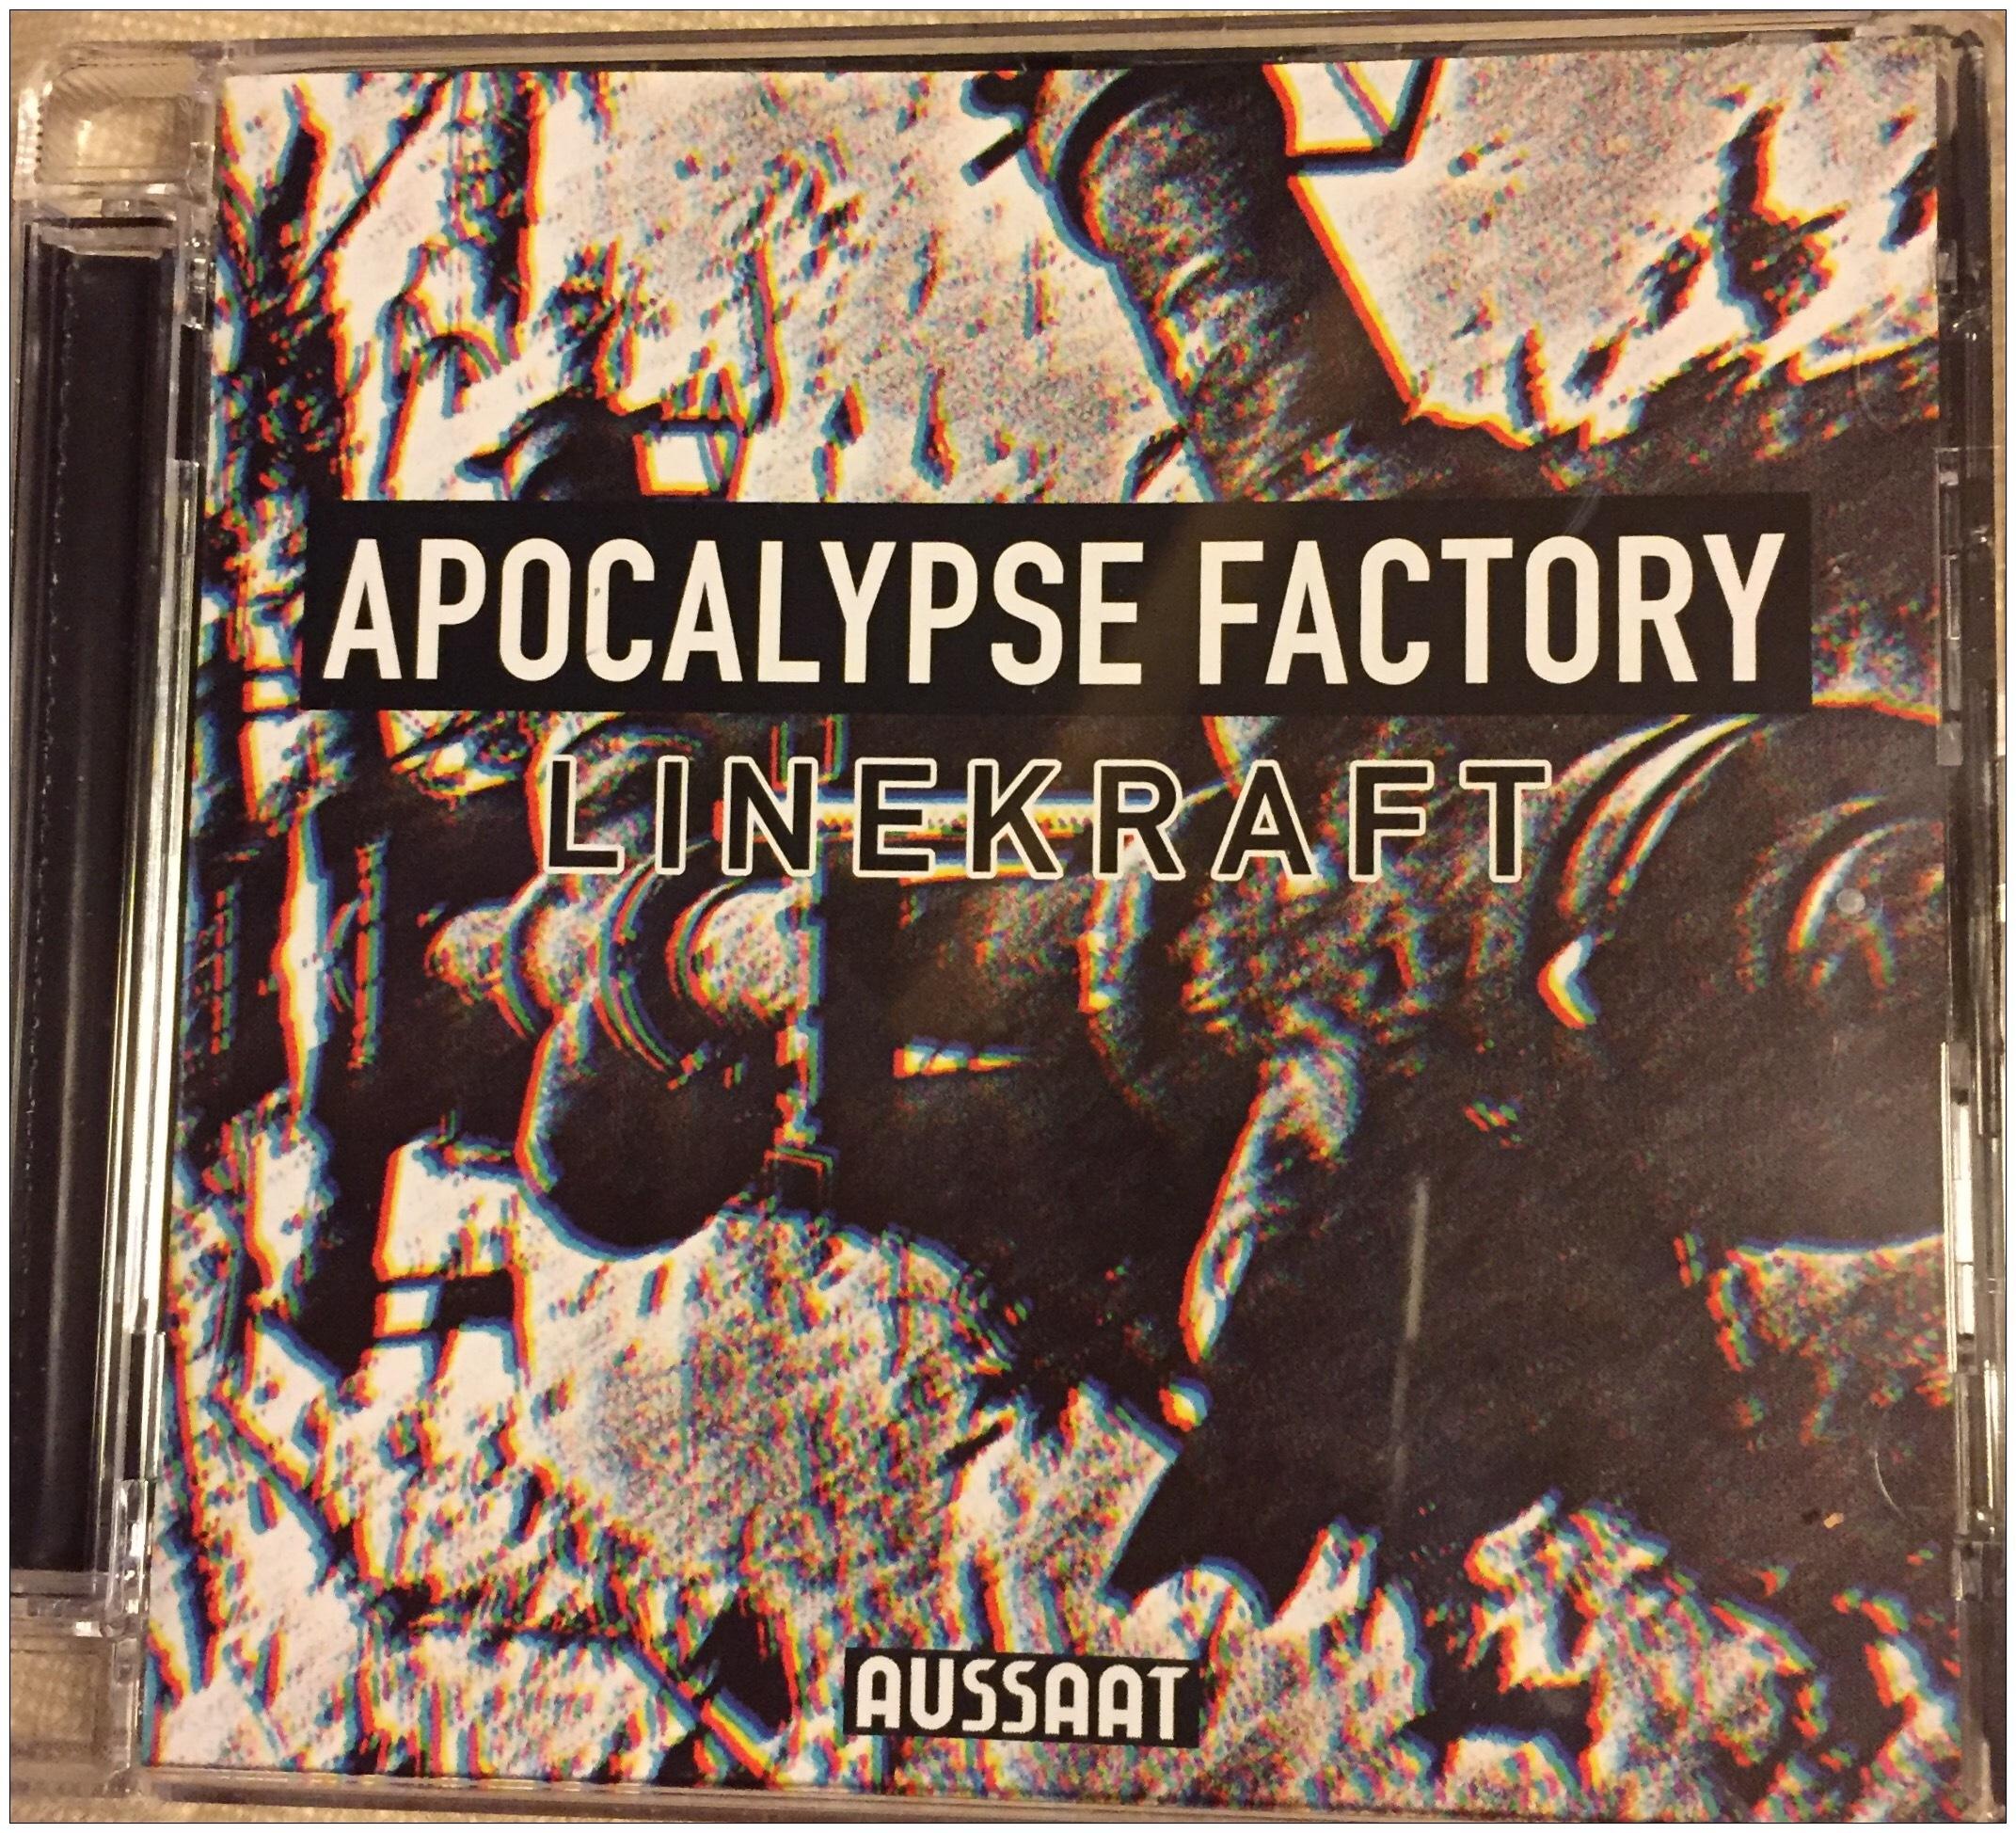 Linekraft - Apocalypse Factory  CD - 画像1